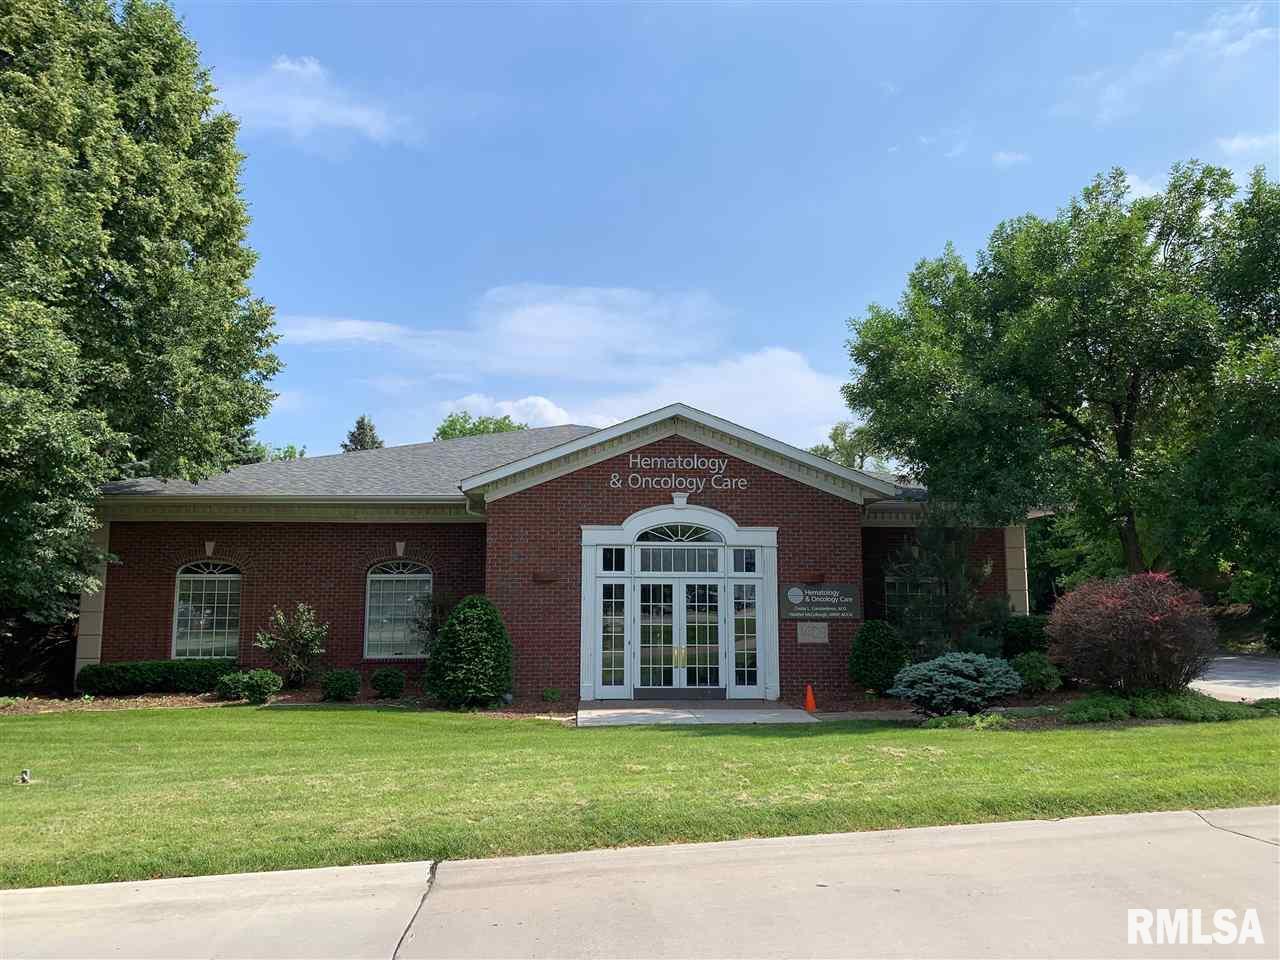 1409 E KIMBERLY Property Photo - Davenport, IA real estate listing